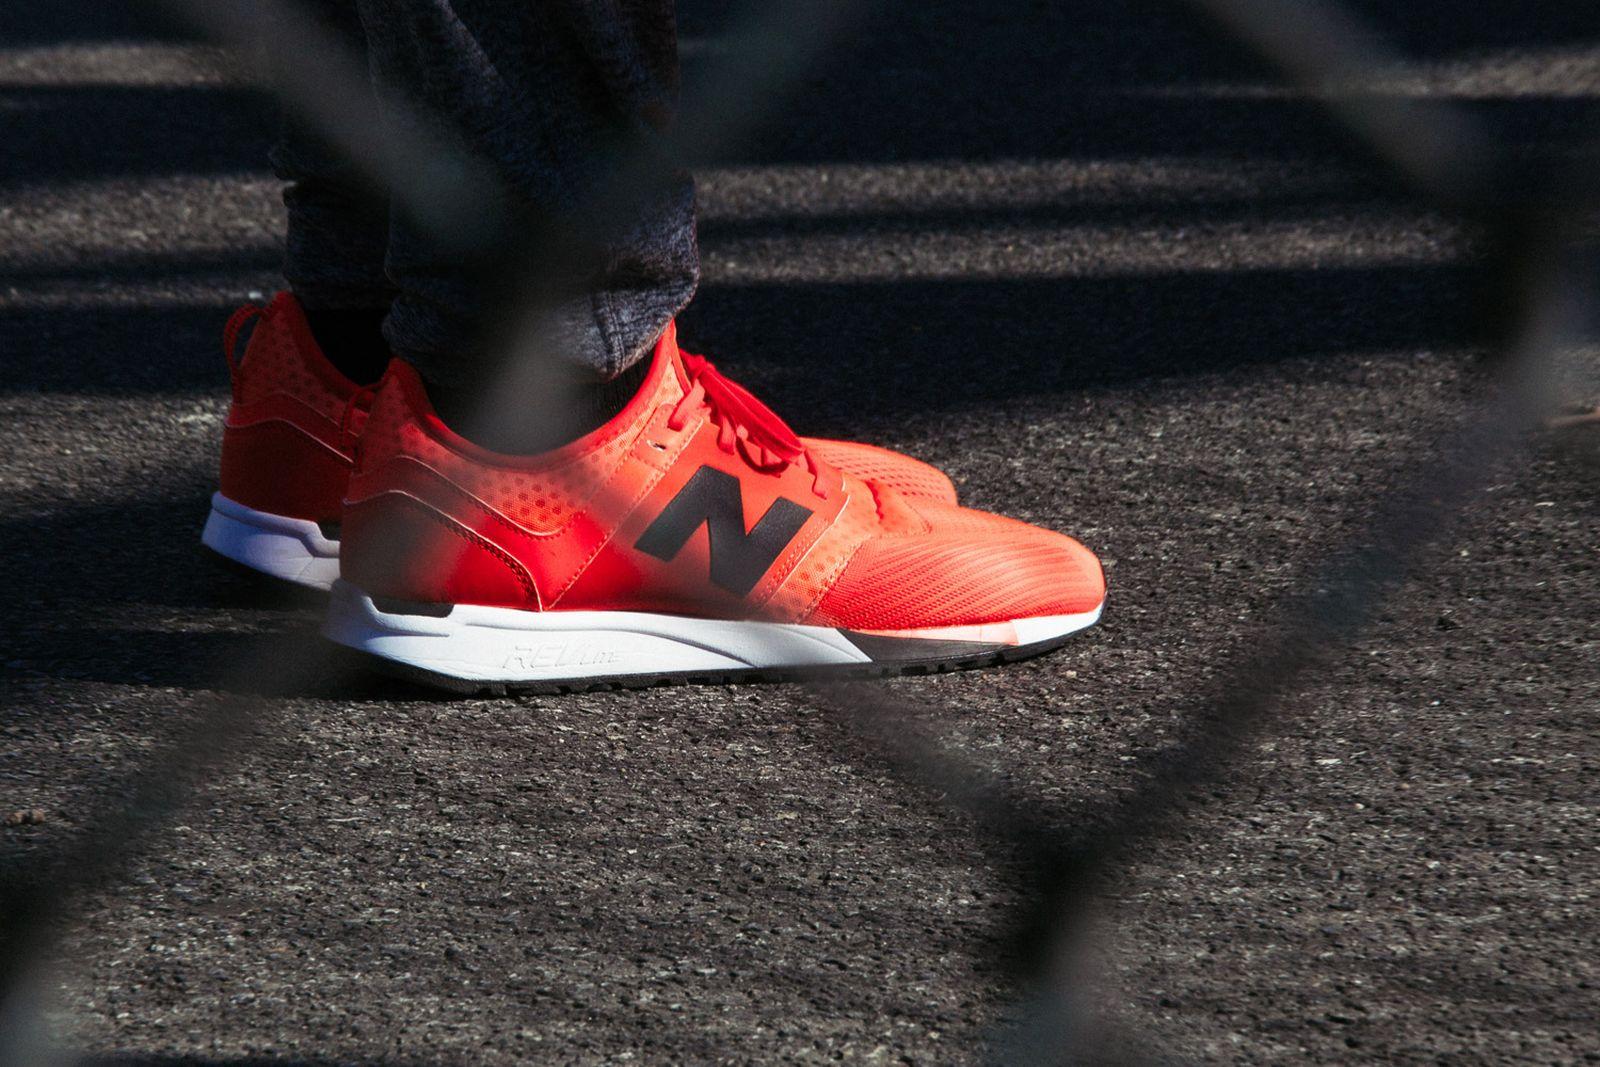 New-Balance-247-Sport-Lookbook-60